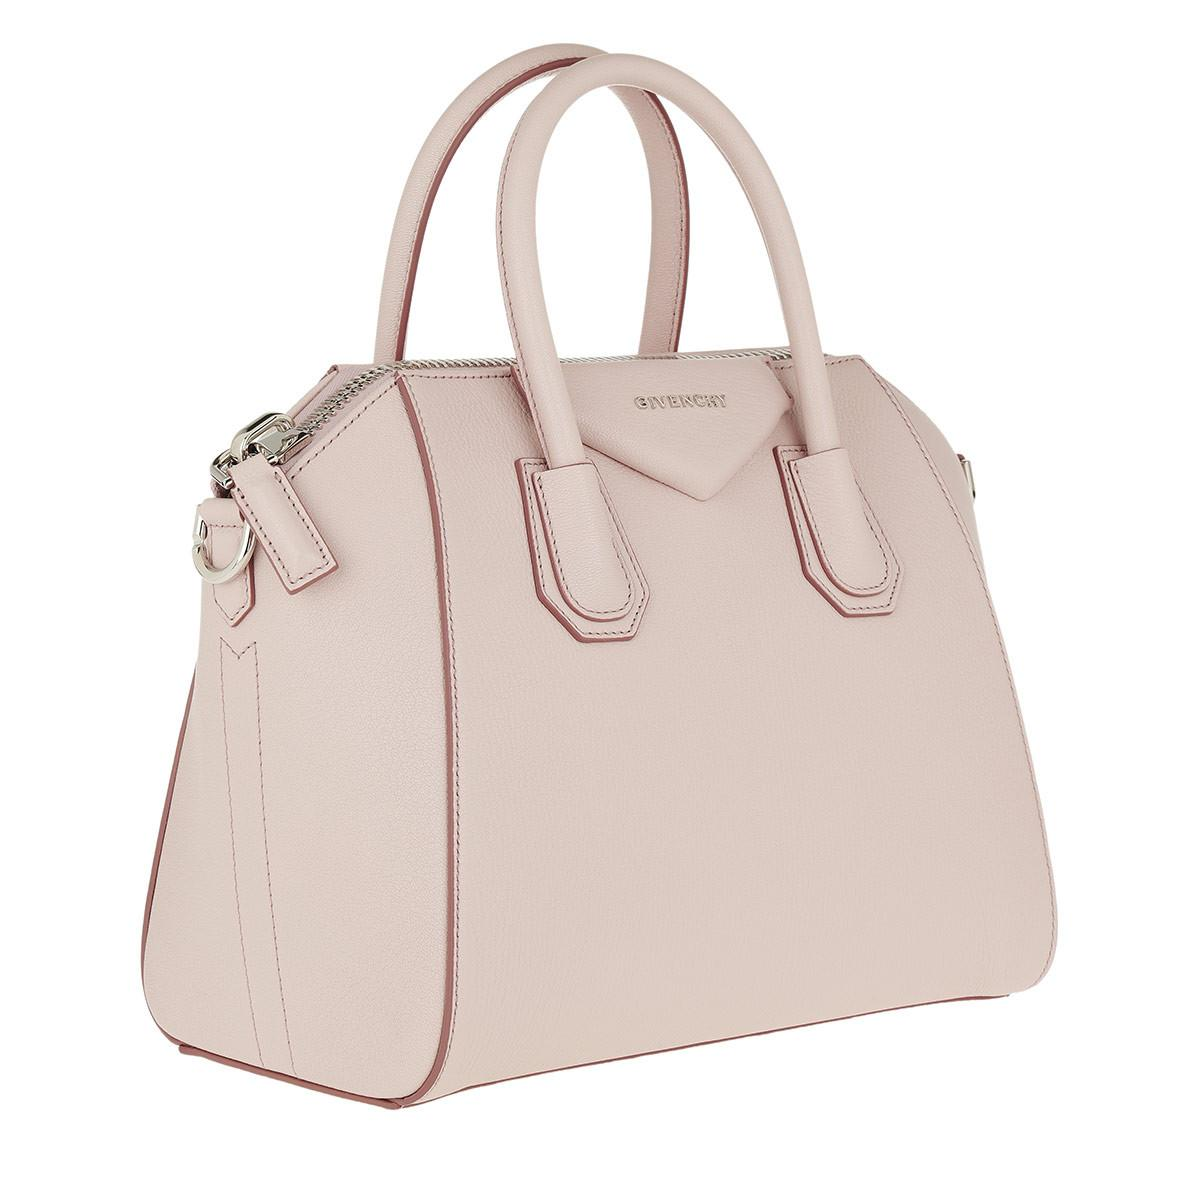 e1bee1e4762 Givenchy Pink Small Antigona Bag in Pink - Save 28% - Lyst